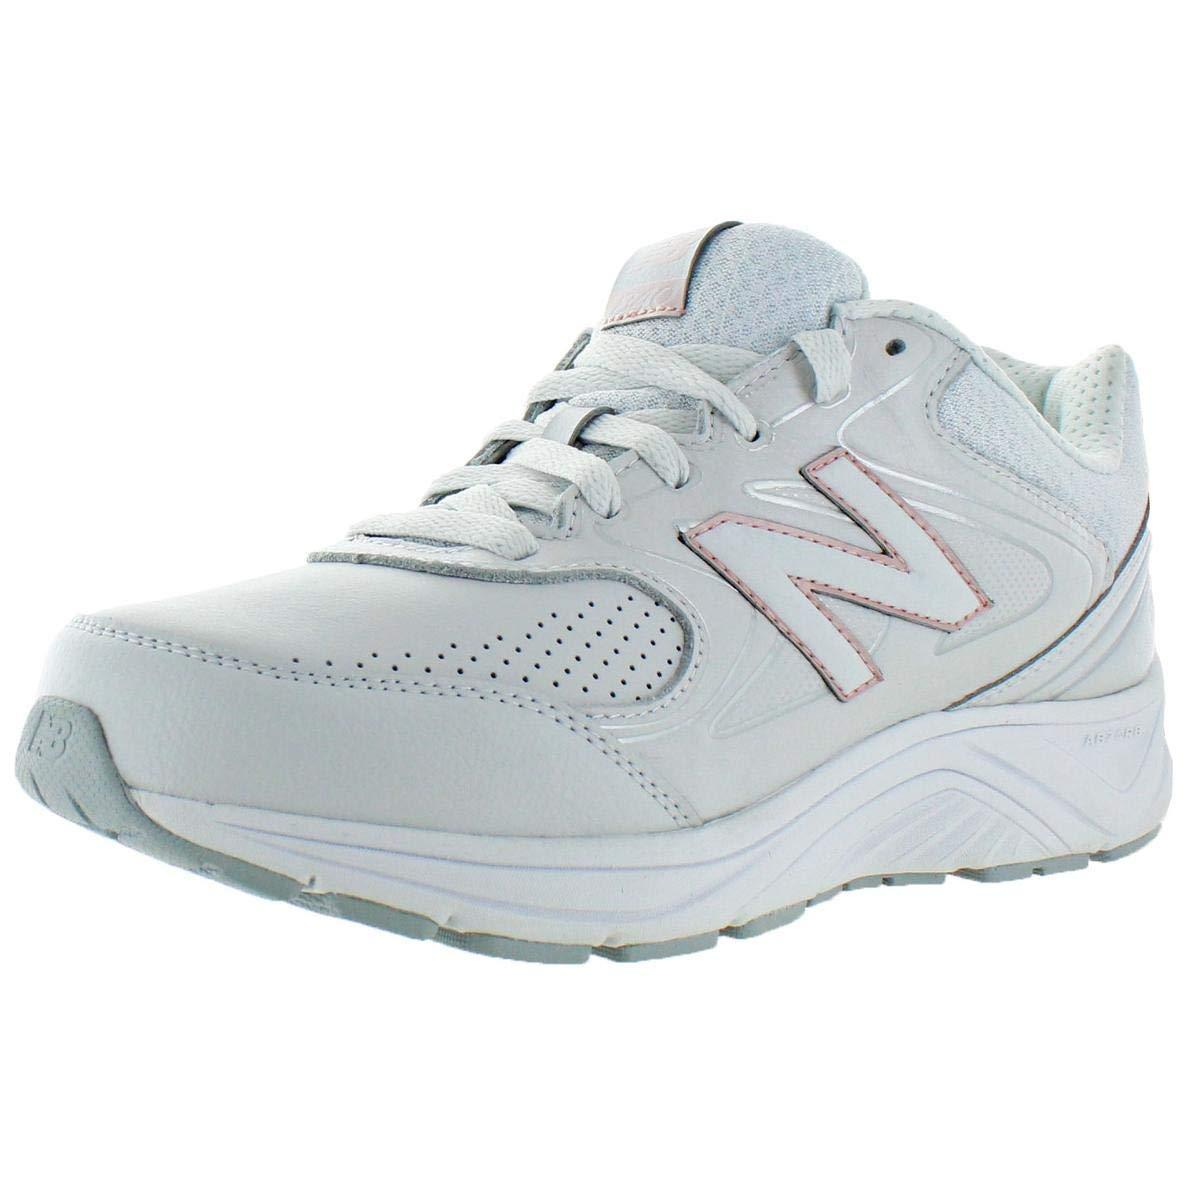 gris Rose or 41 EU 2E nouveau   840, Chaussures Multisport Indoor Femme